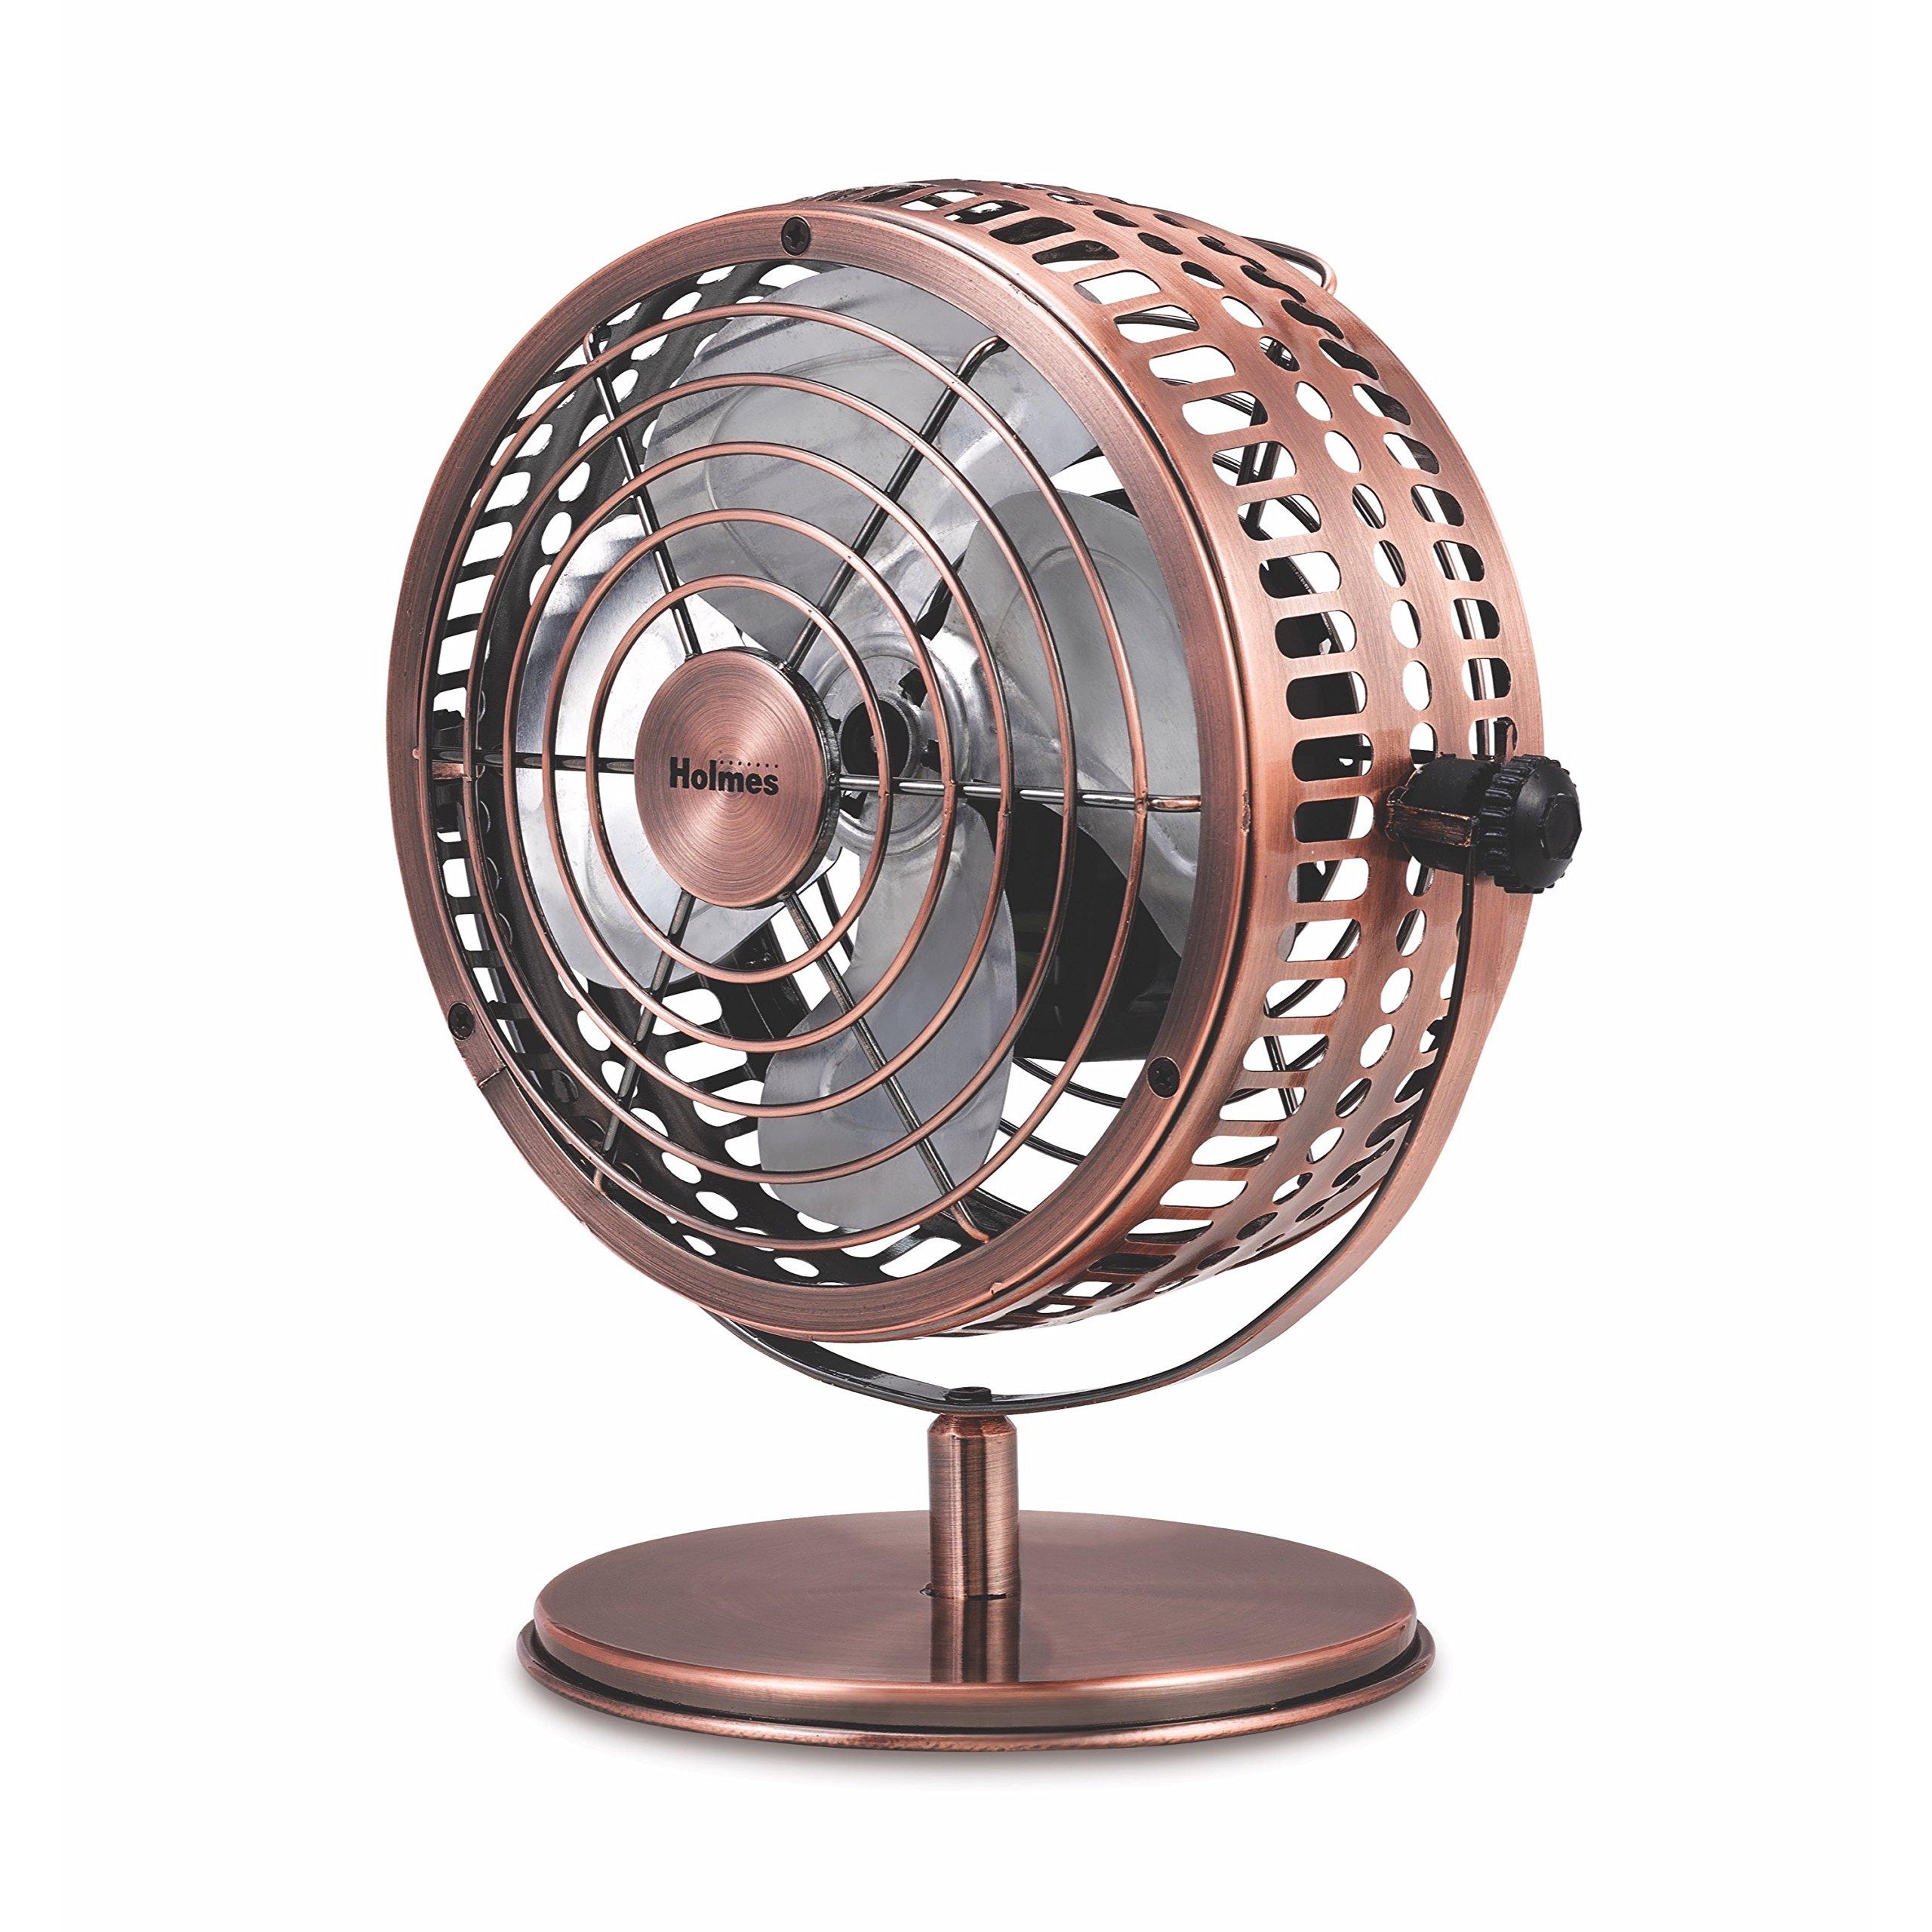 Holmes Heritage Desk Fan, 6-inch, Brushed Copper by Holmes